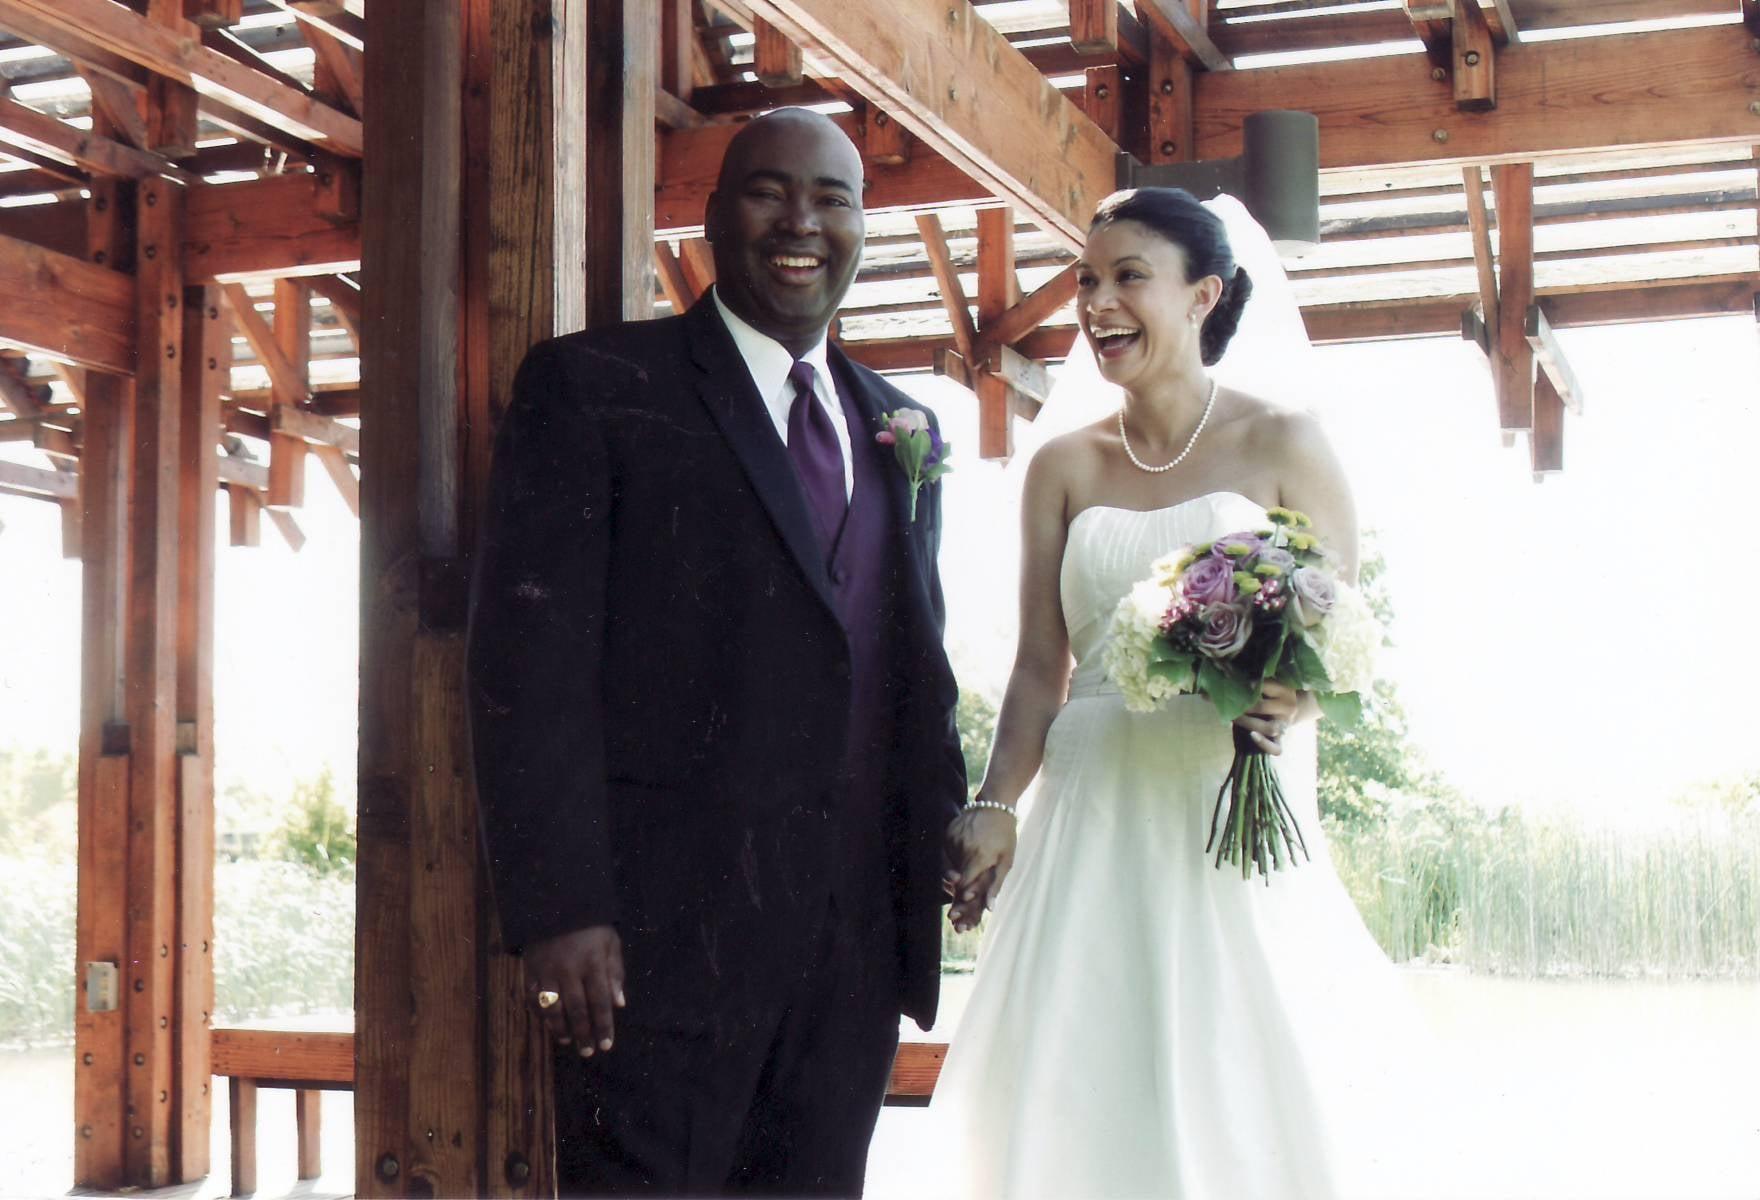 Jaime Harrison with wife Marie C. Boyd on their wedding day